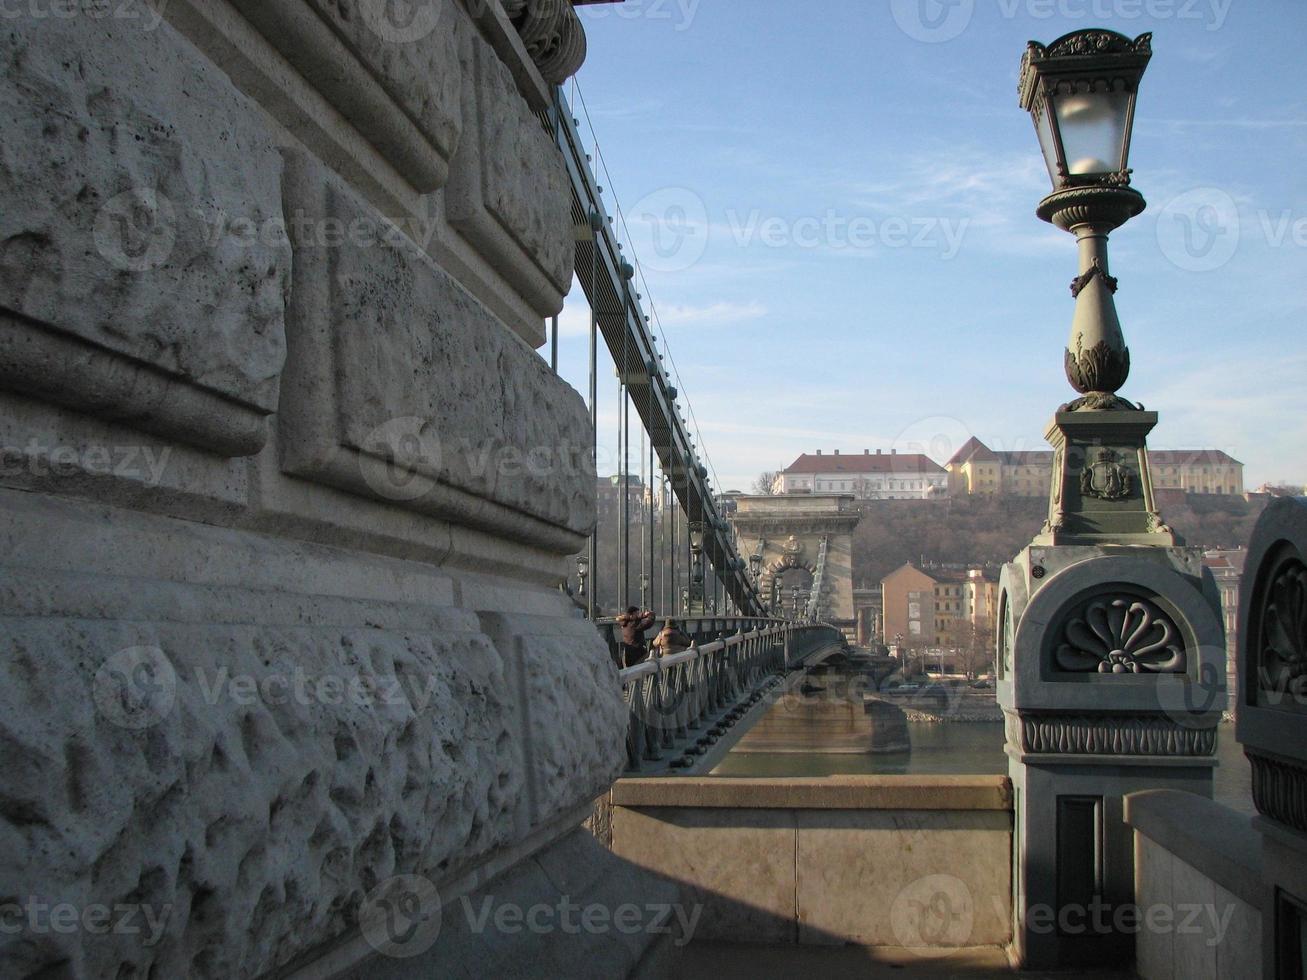 die Kettenbrücke foto